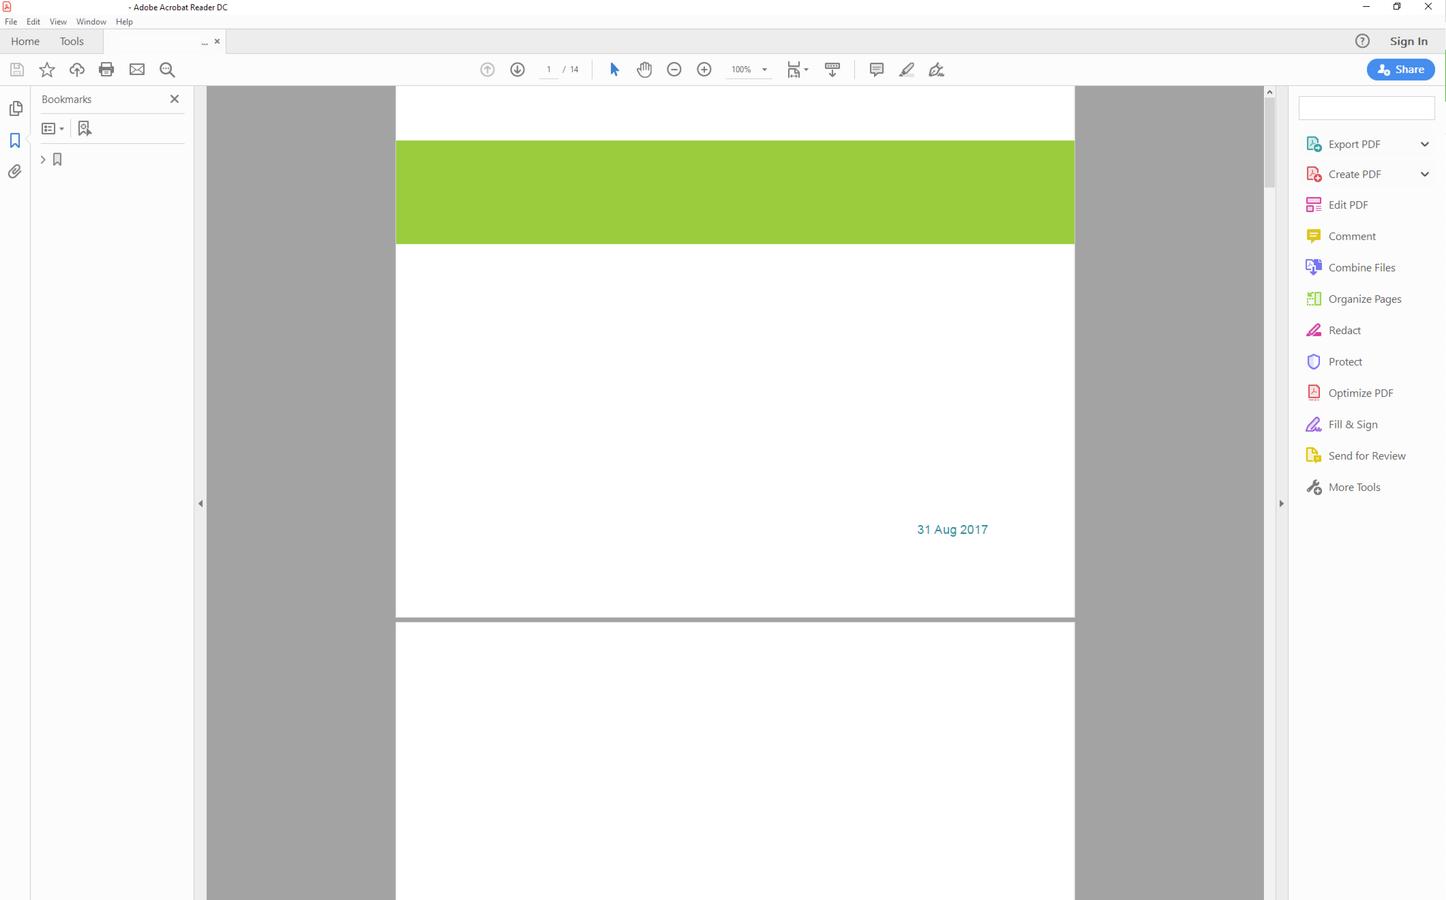 Adobe manual